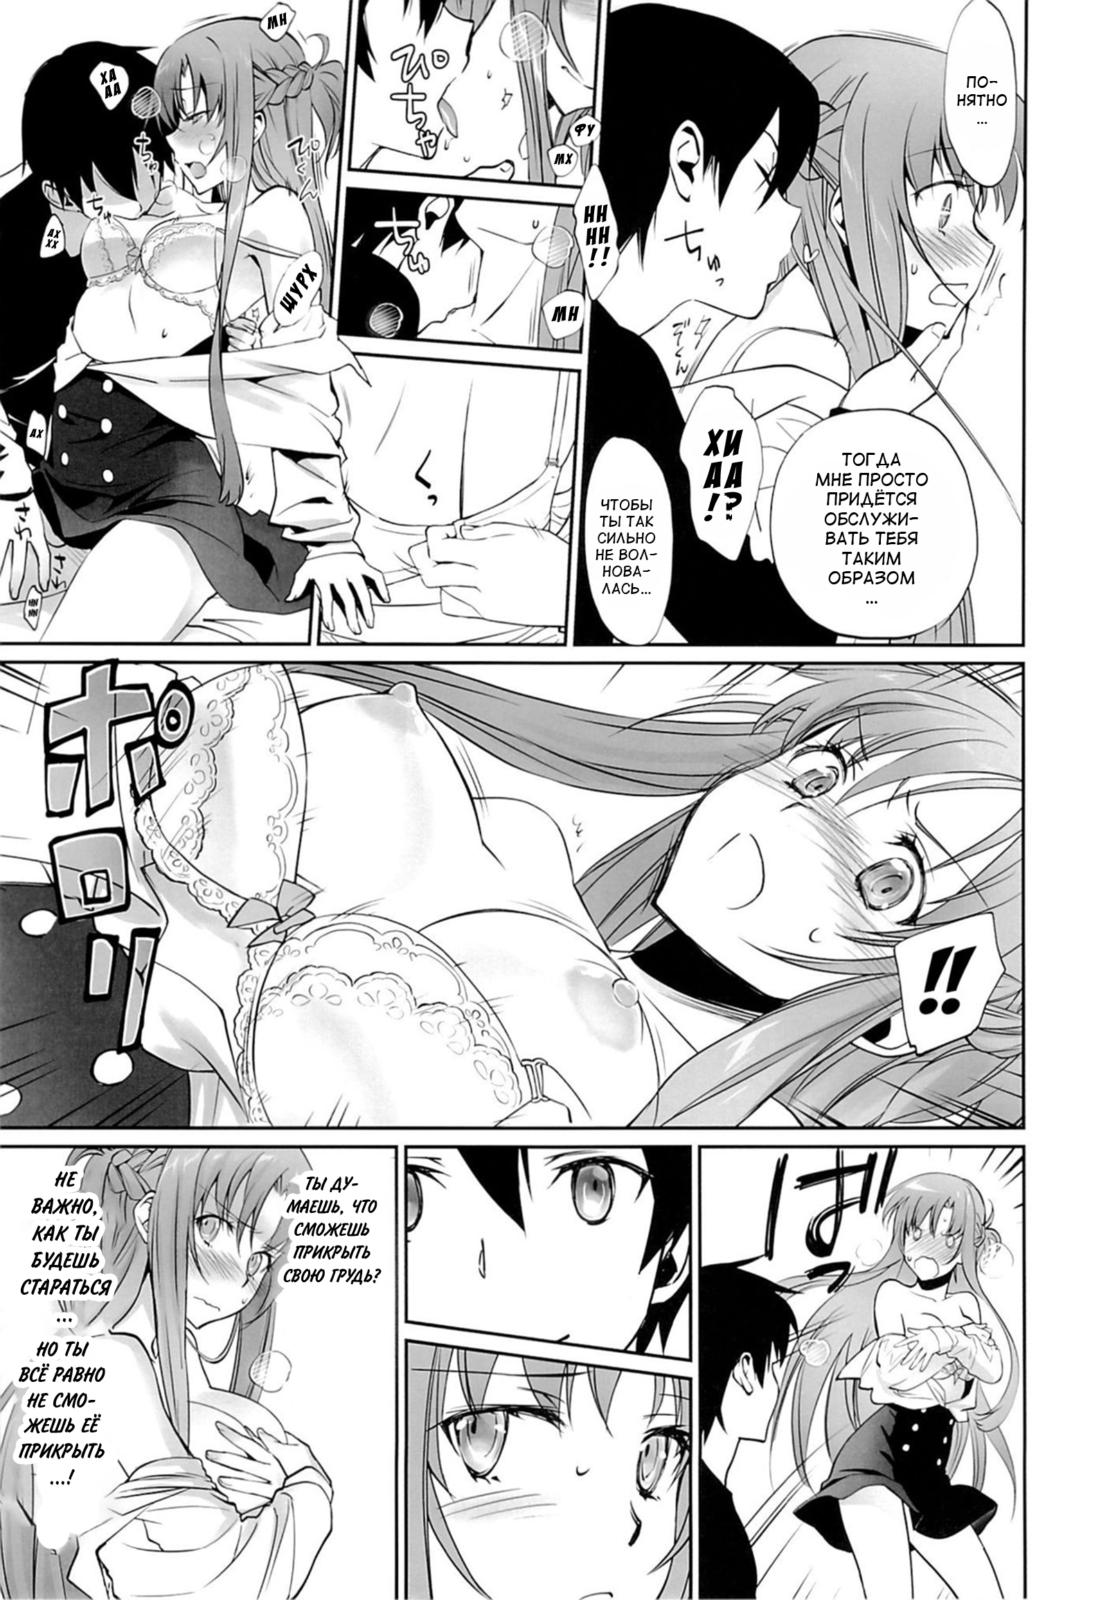 Turnover / Оборот SAO Асуна хентай манга - Сиськи, романтика, инцест, измена, большие сиськи